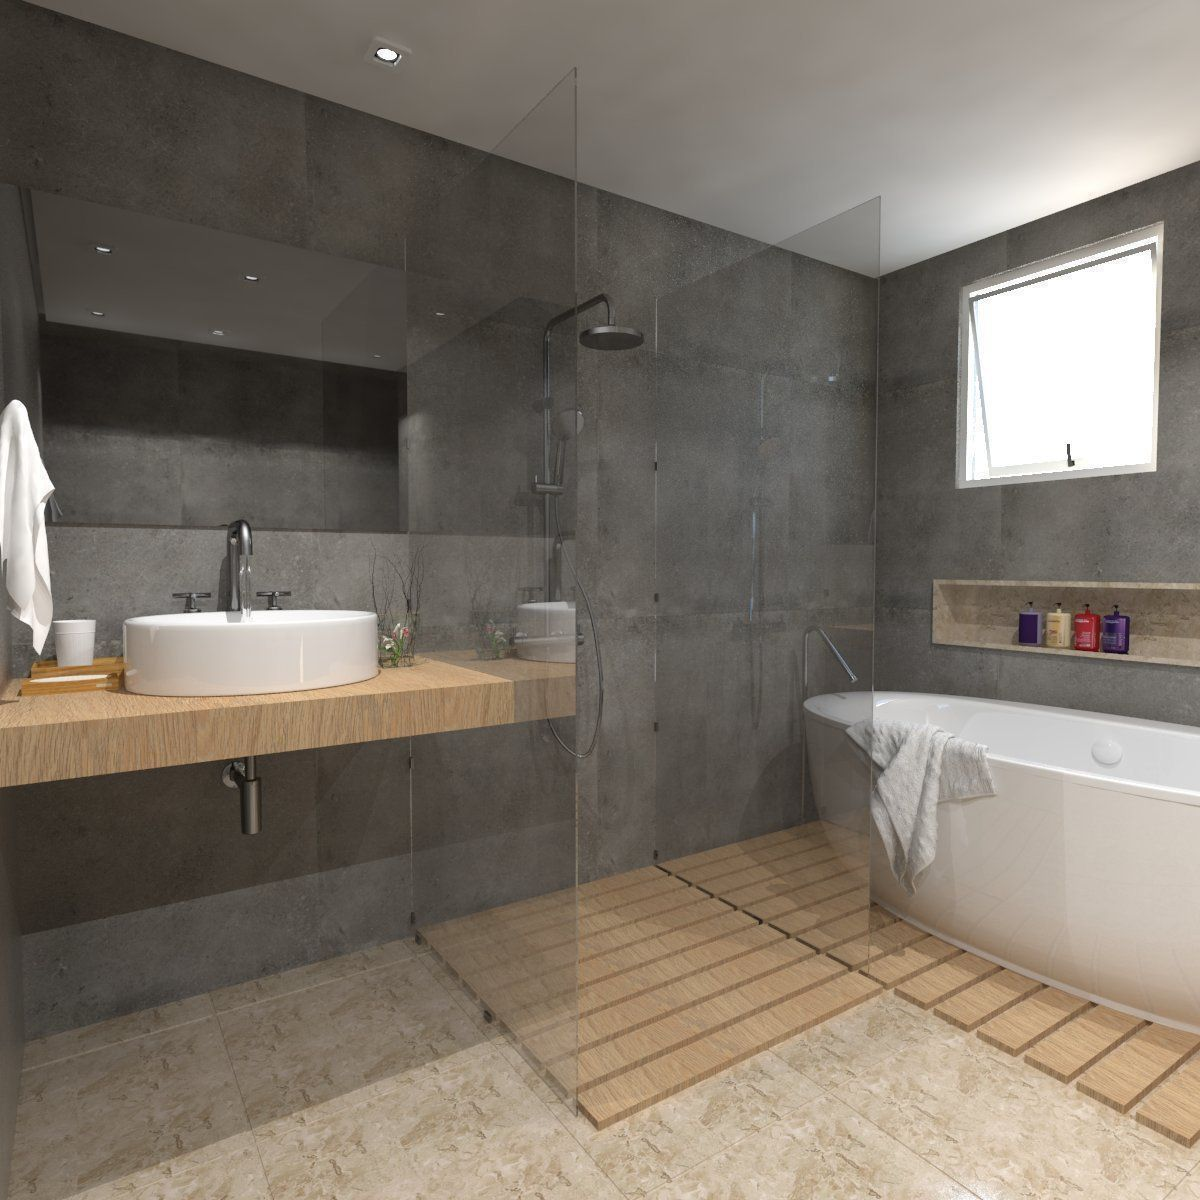 Detailed Bathroom 3d Model Skp 3 Bathroomdesign3dmodel Idee Salle De Bain Salle De Bain Design Salle De Bains Moderne